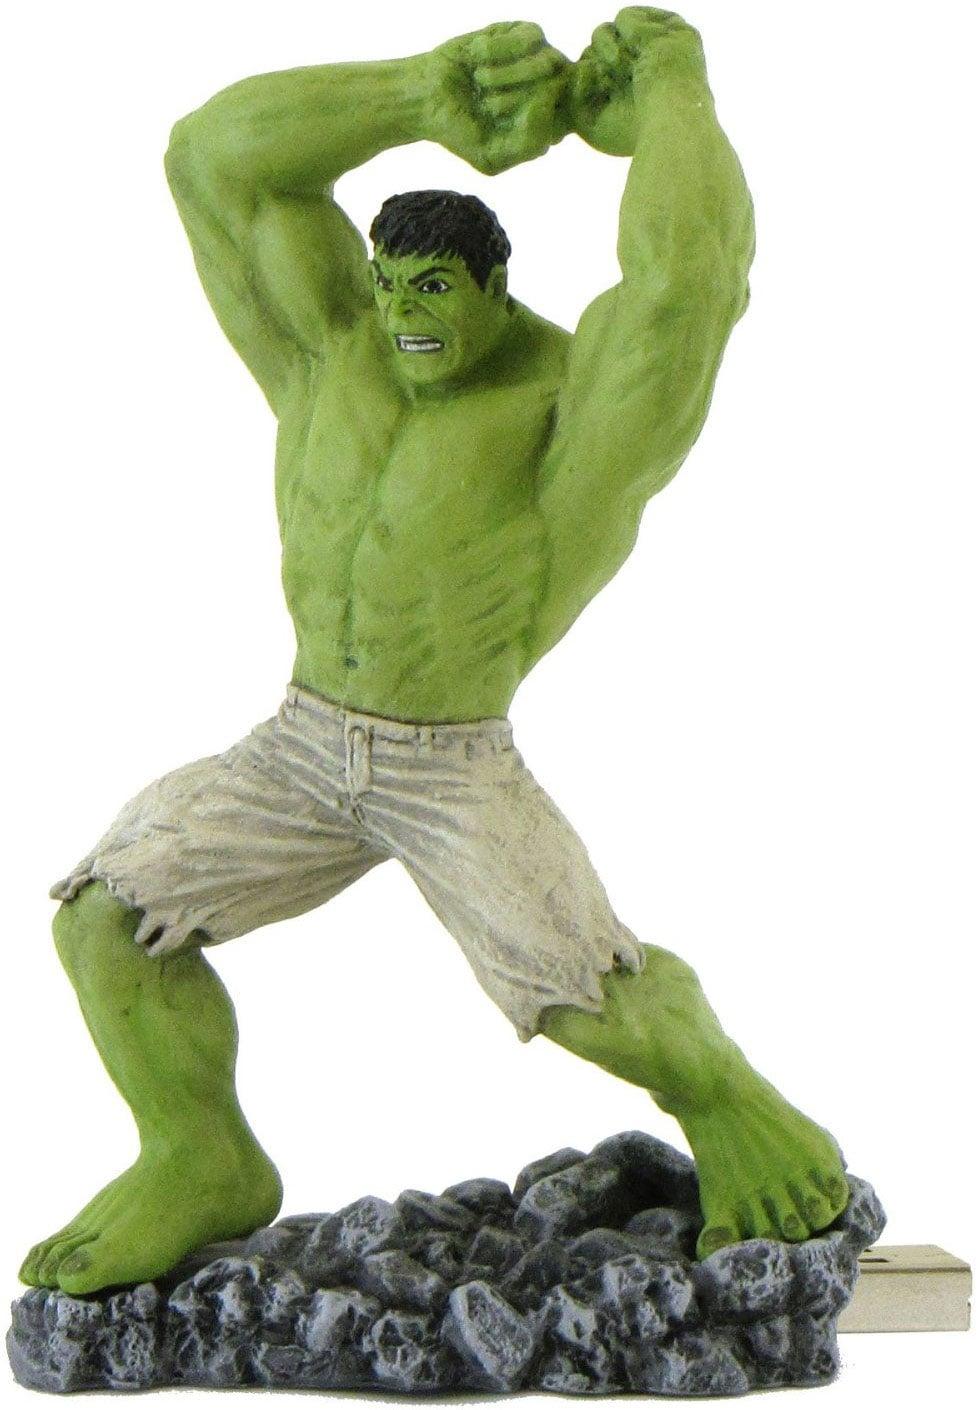 Gigastone 8GB Avengers USB Flash Drive - Hulk